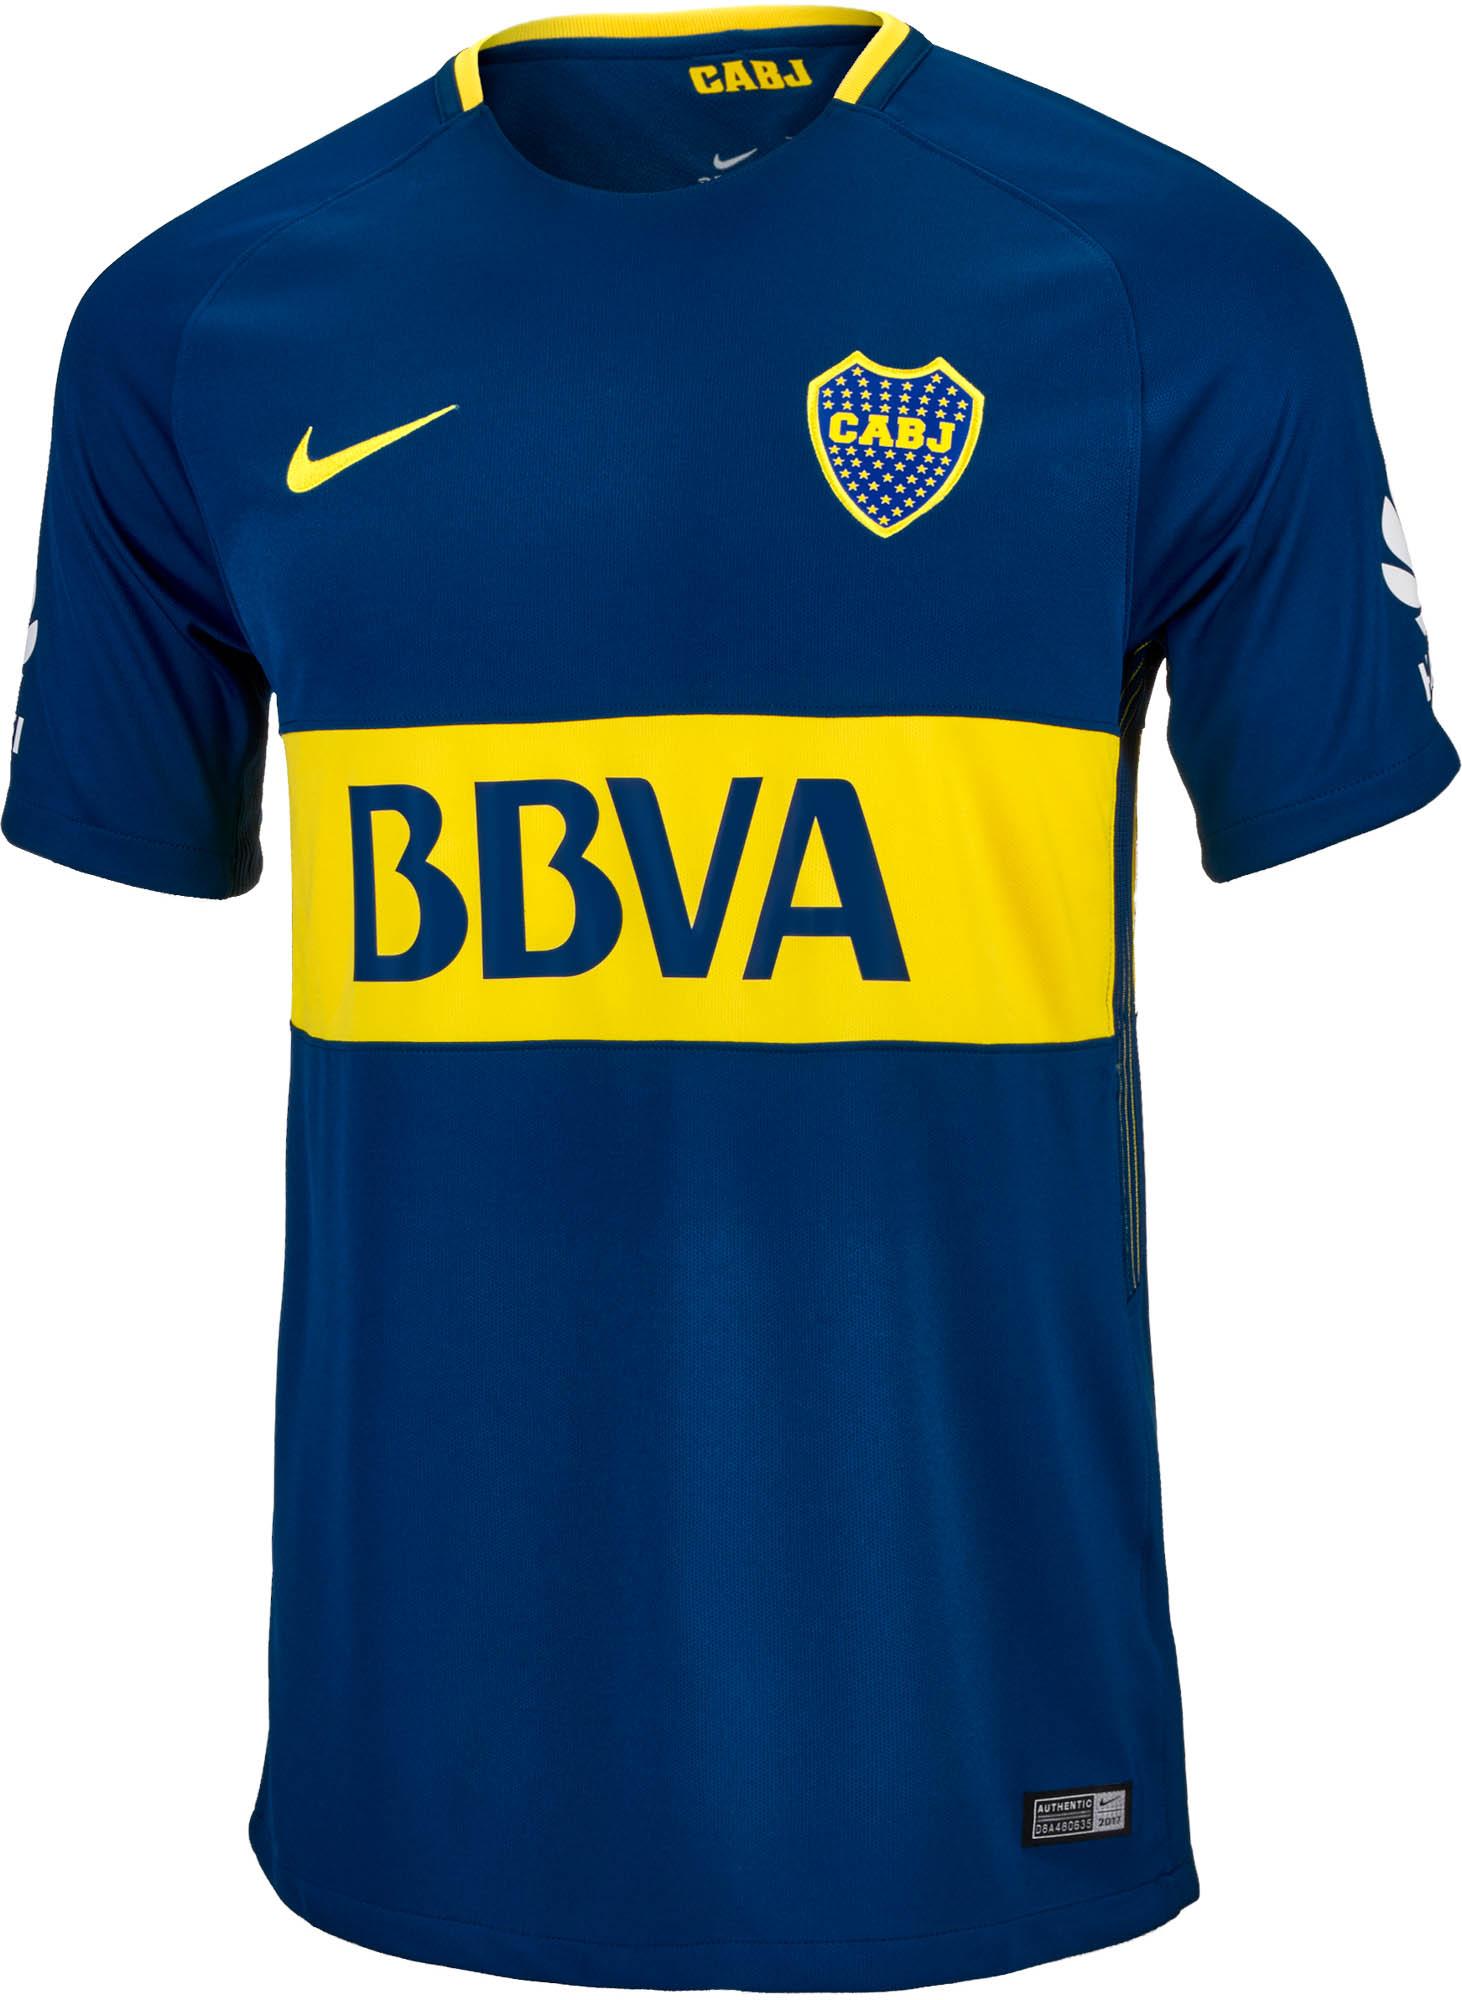 online store 85760 b1f43 Nike Boca Juniors Home Jersey 2017-18